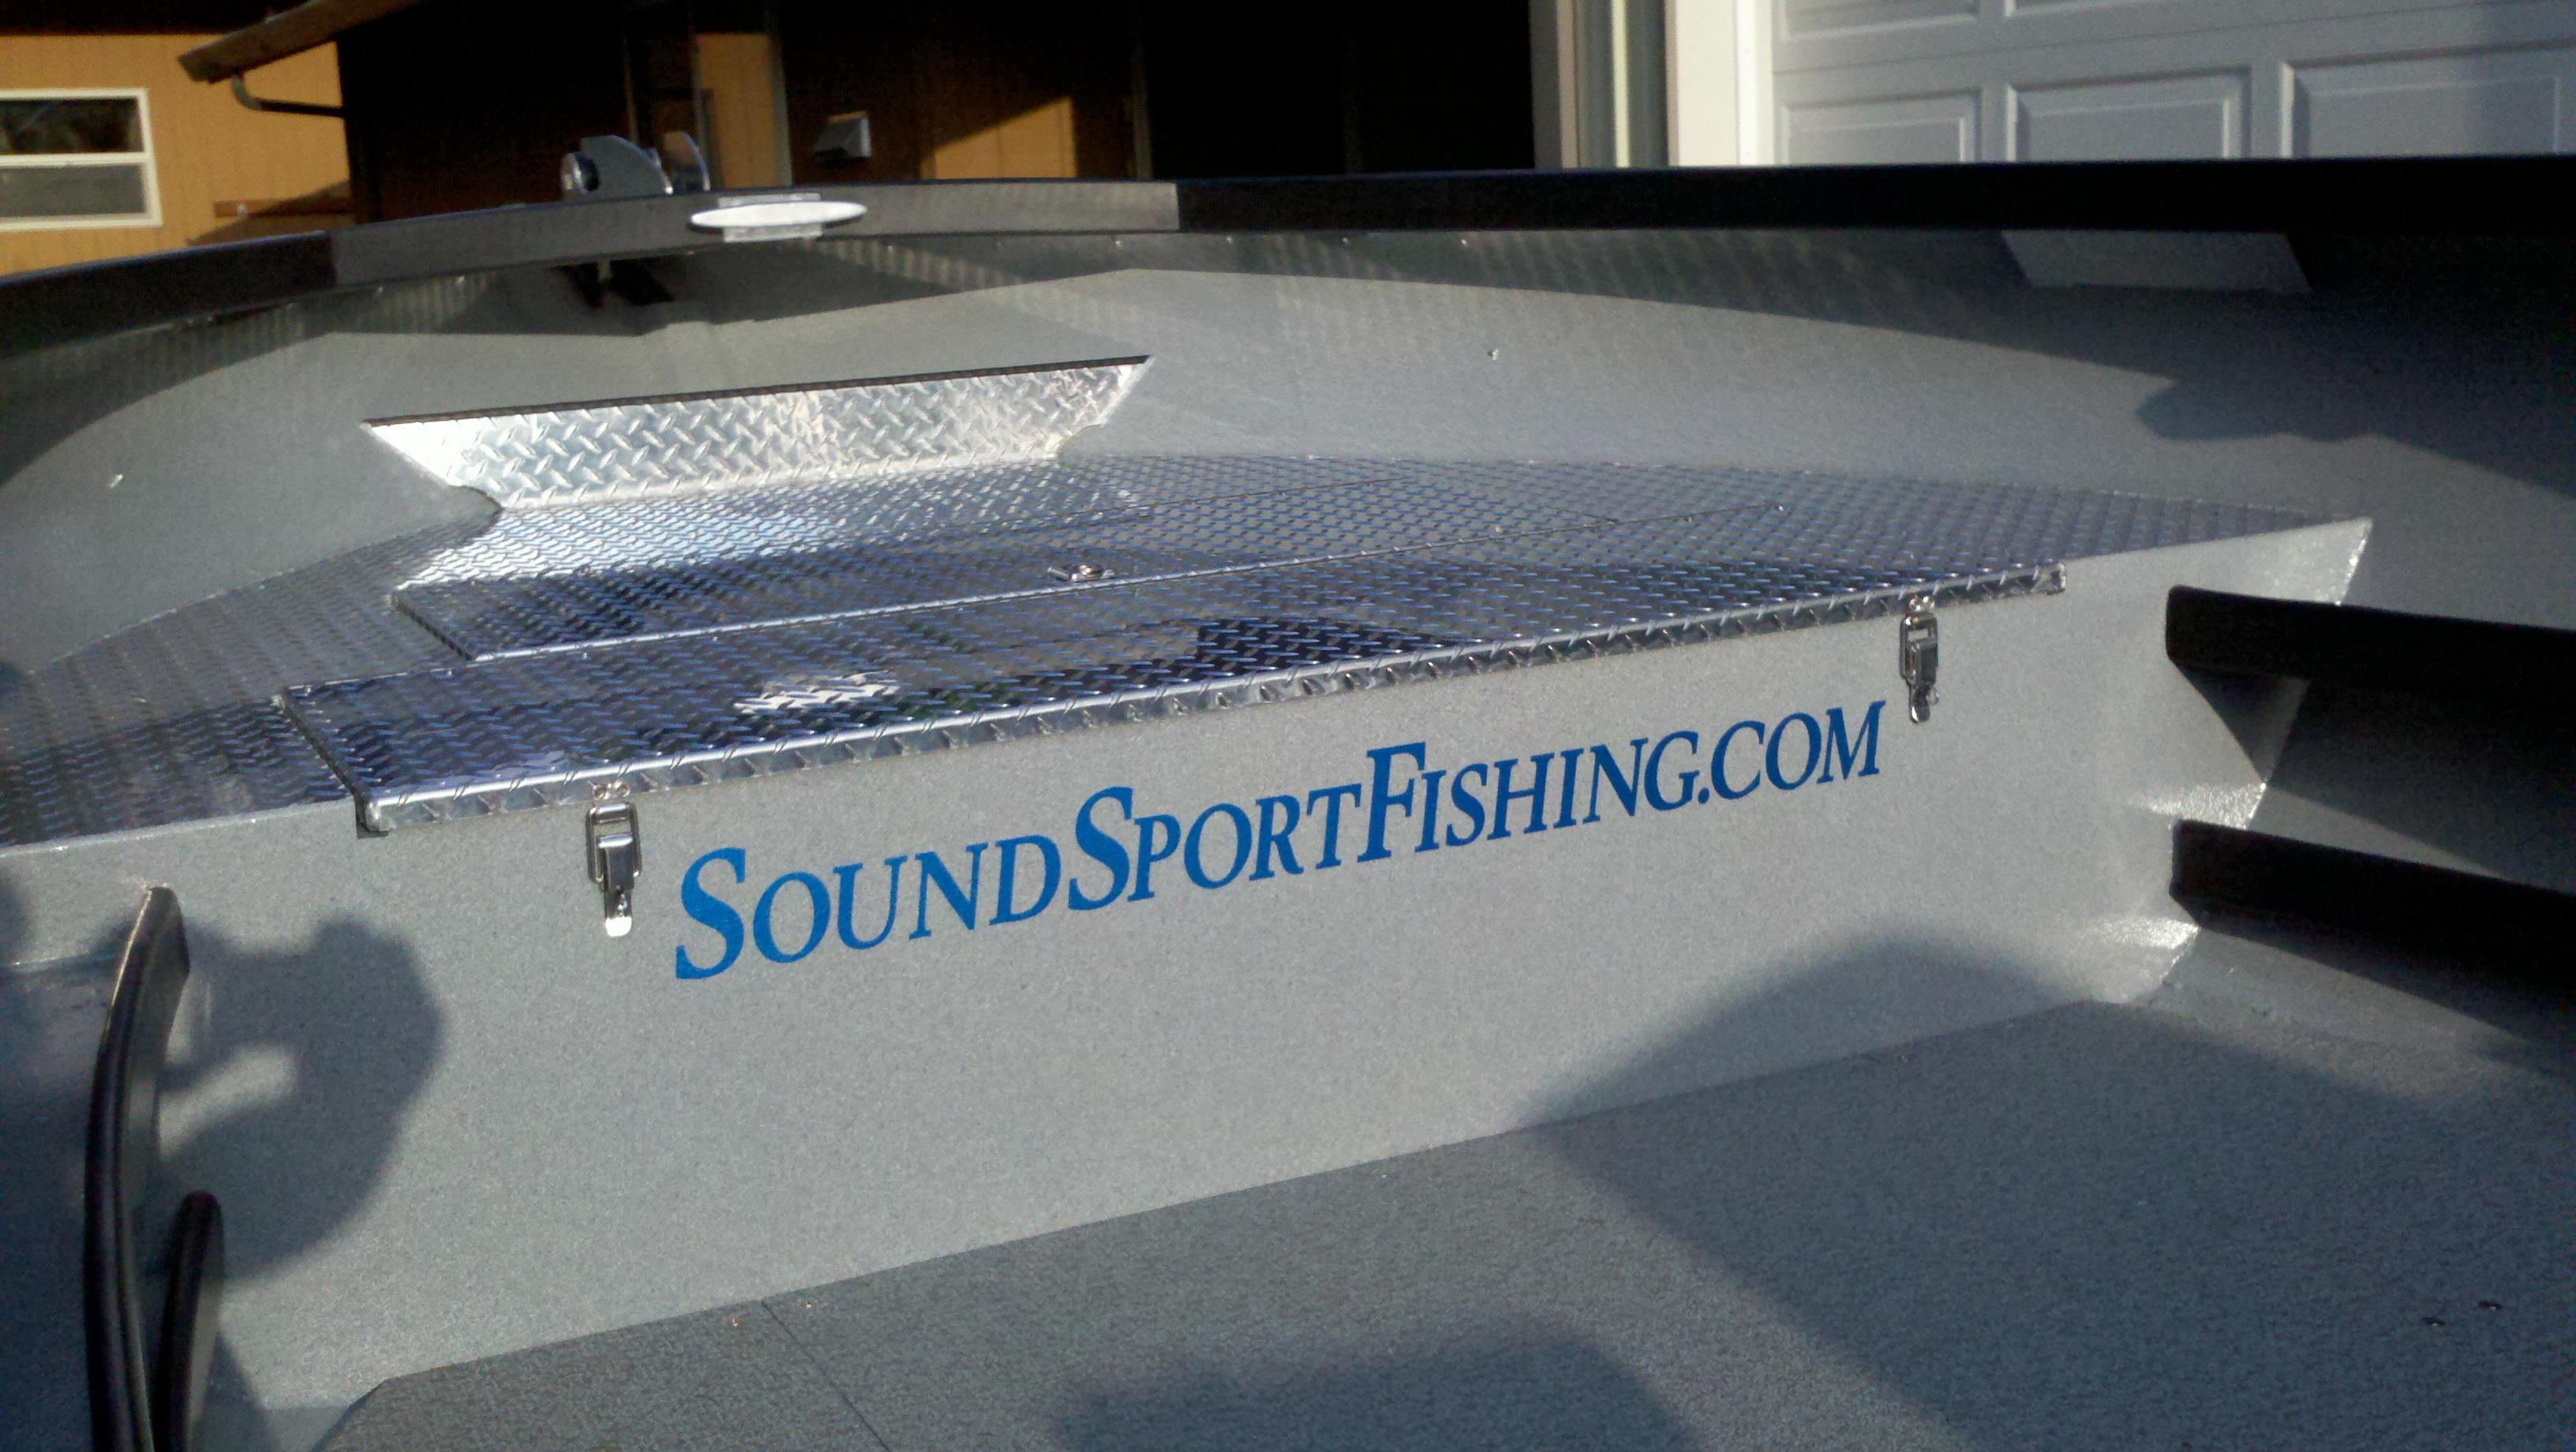 SoundSportFishing.com Boat With Marine Barrier